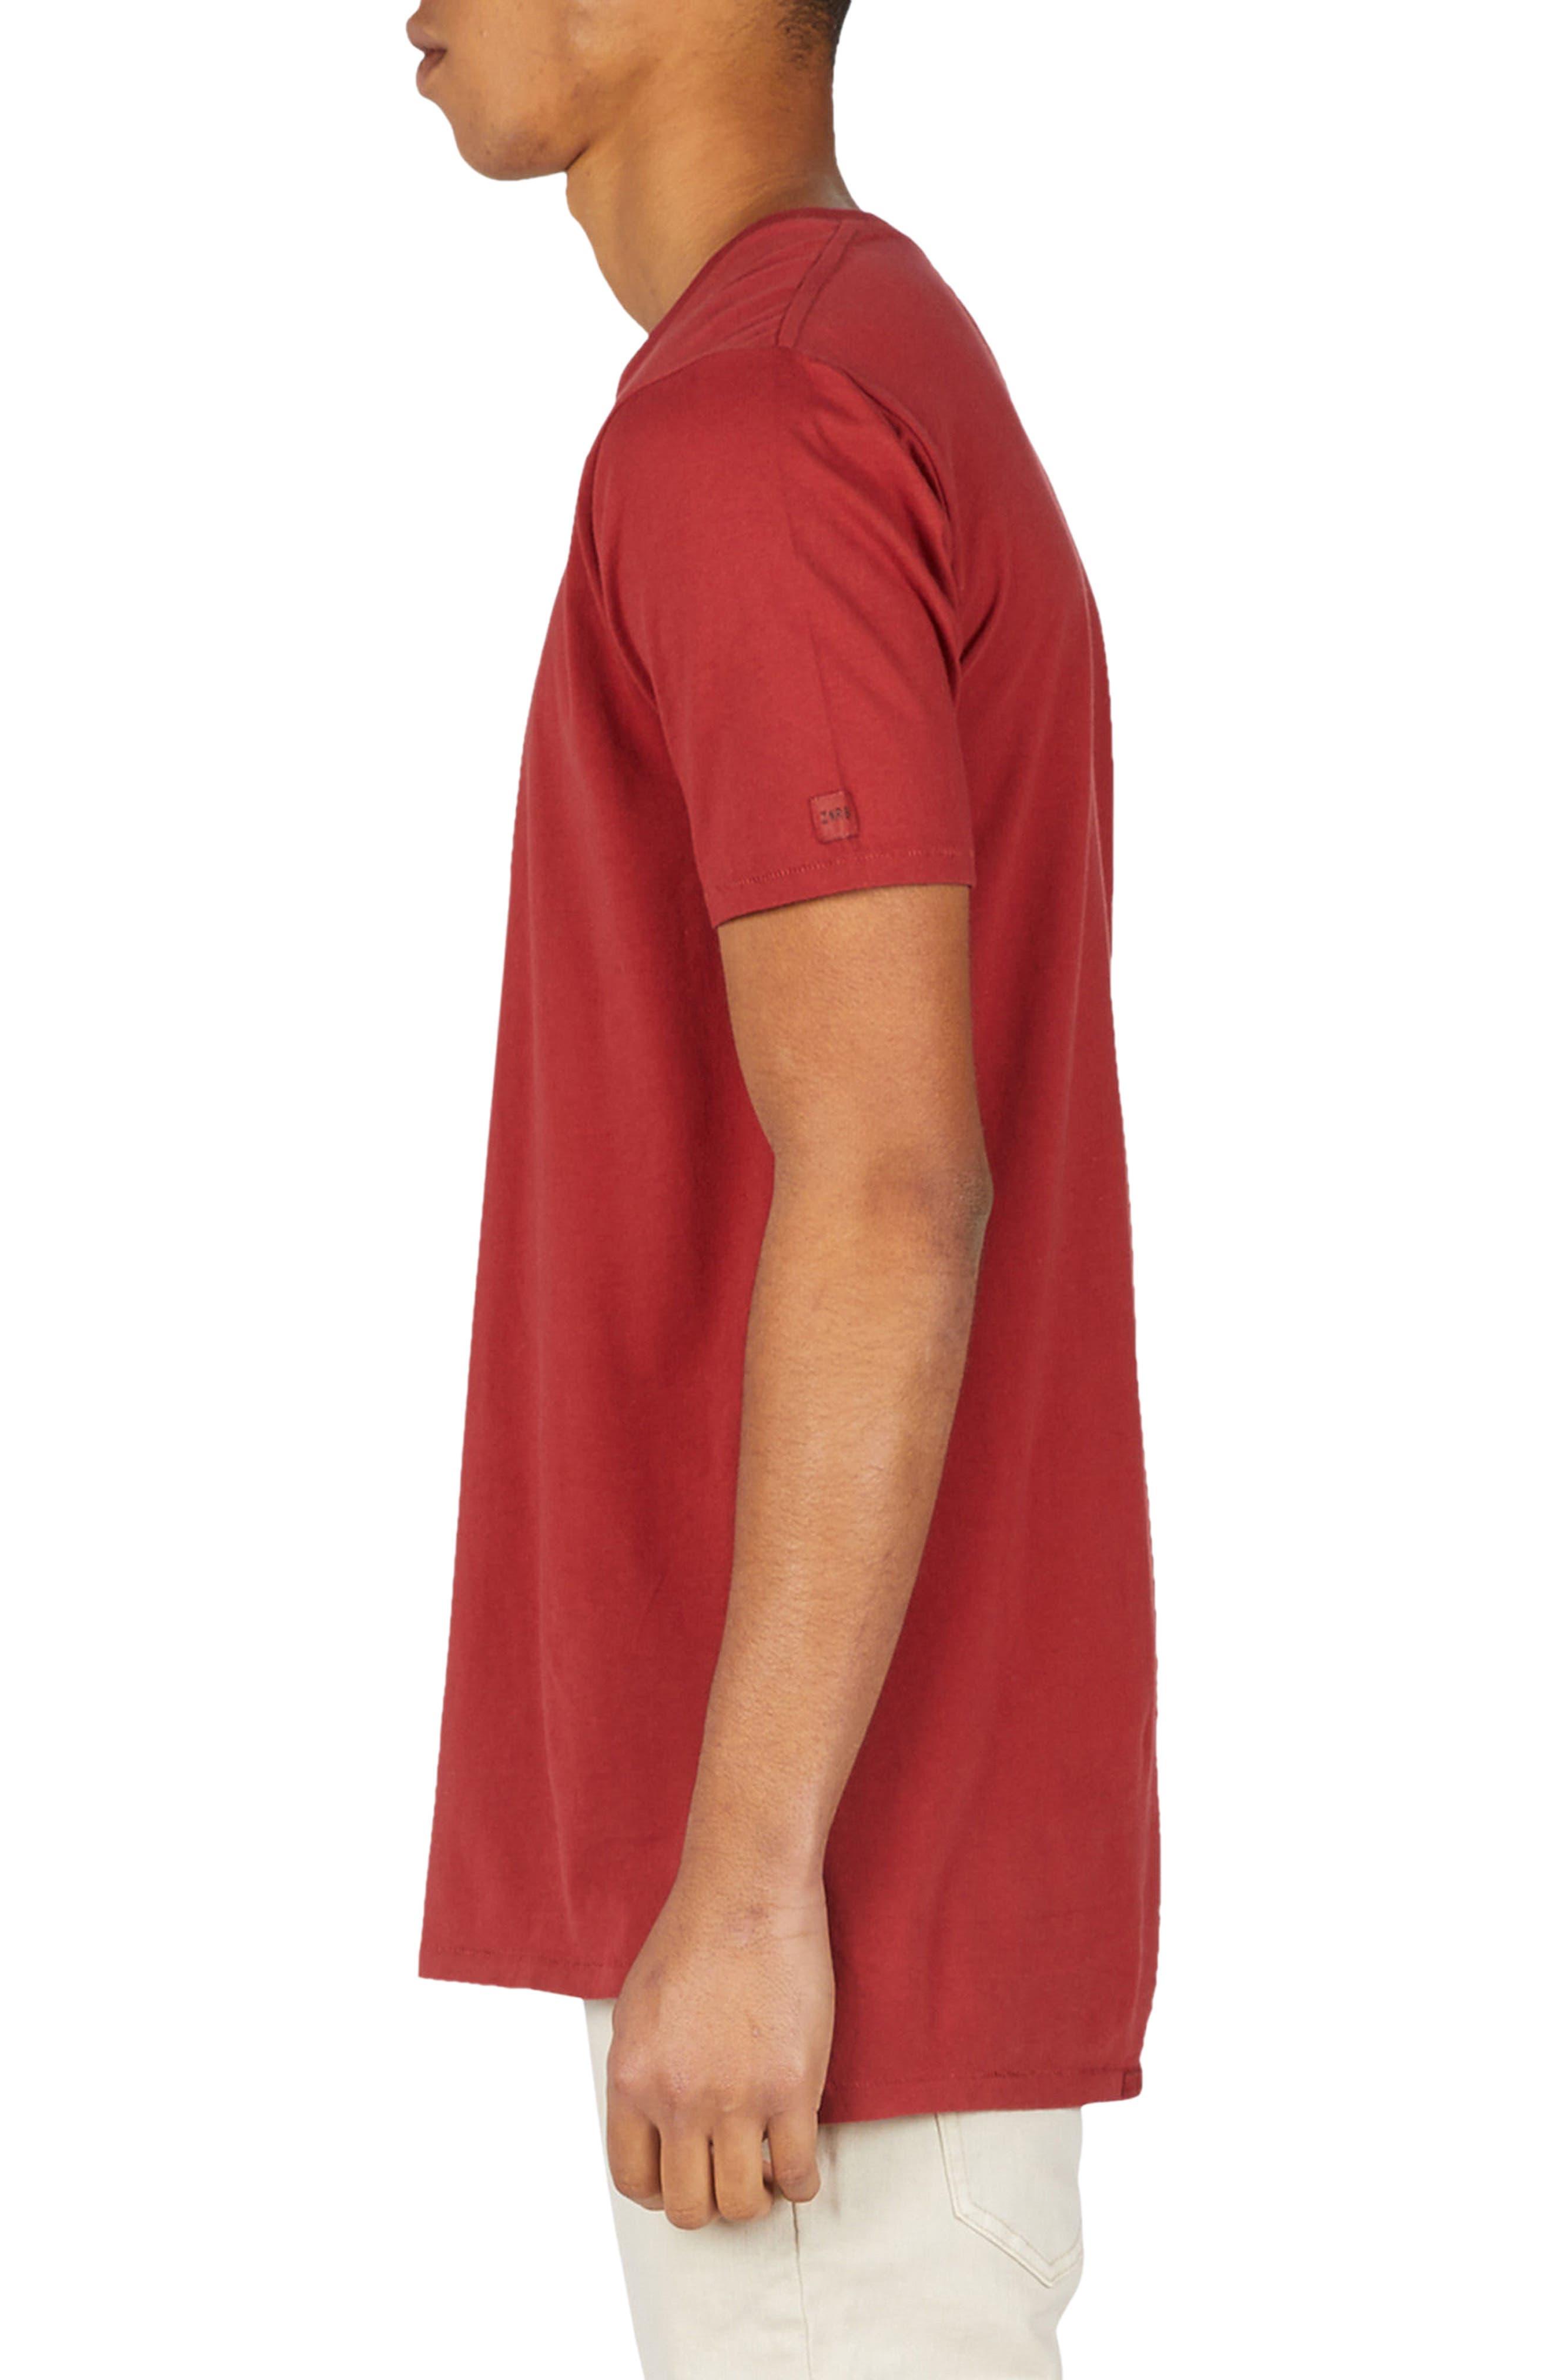 Flintlock T-Shirt,                             Alternate thumbnail 3, color,                             601